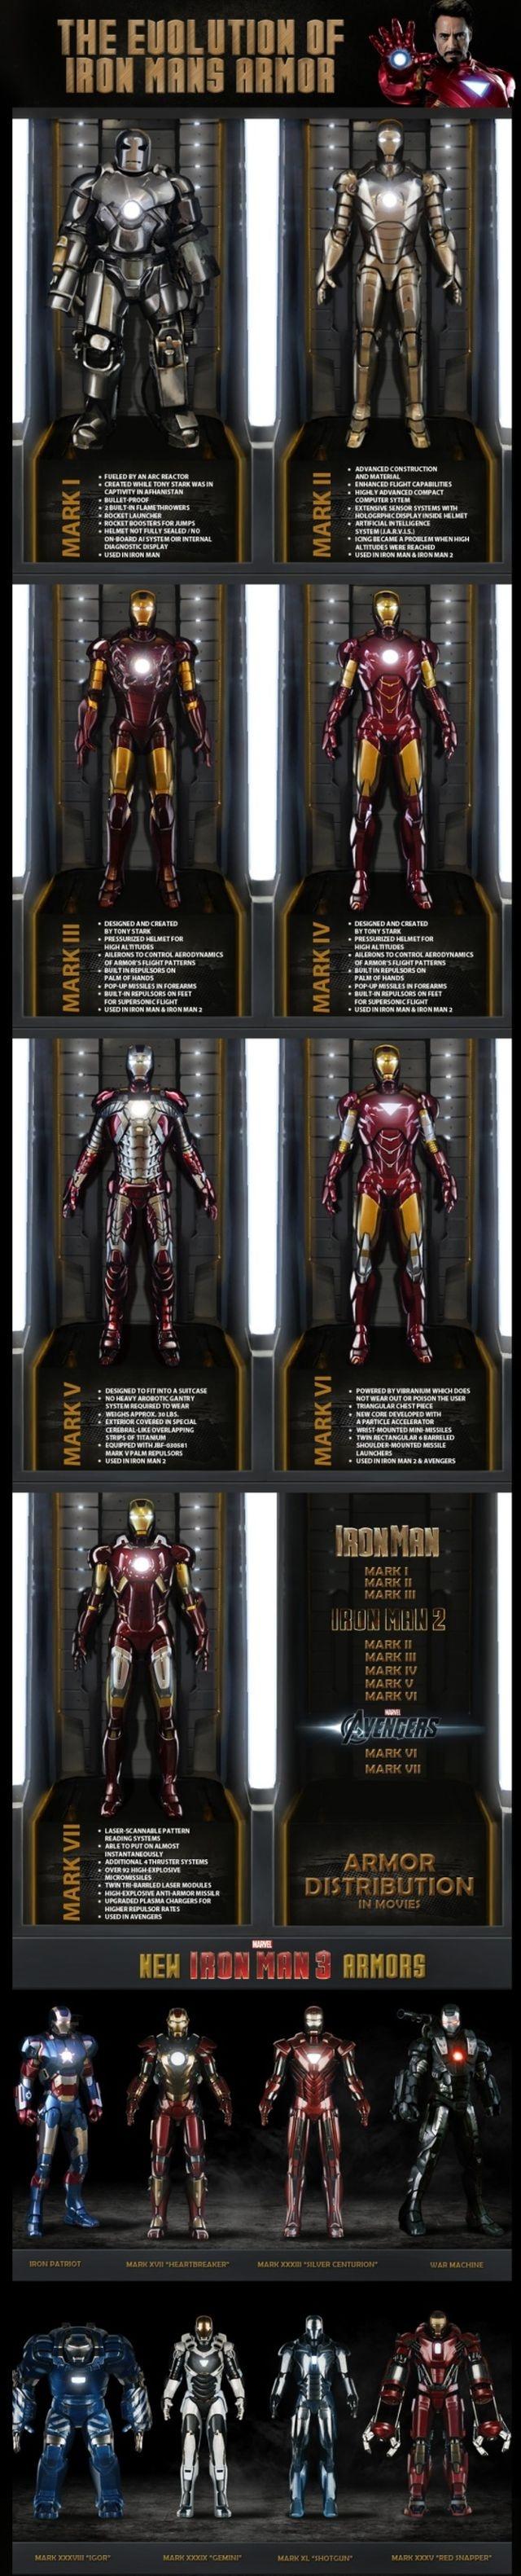 evolution of iron man's armor